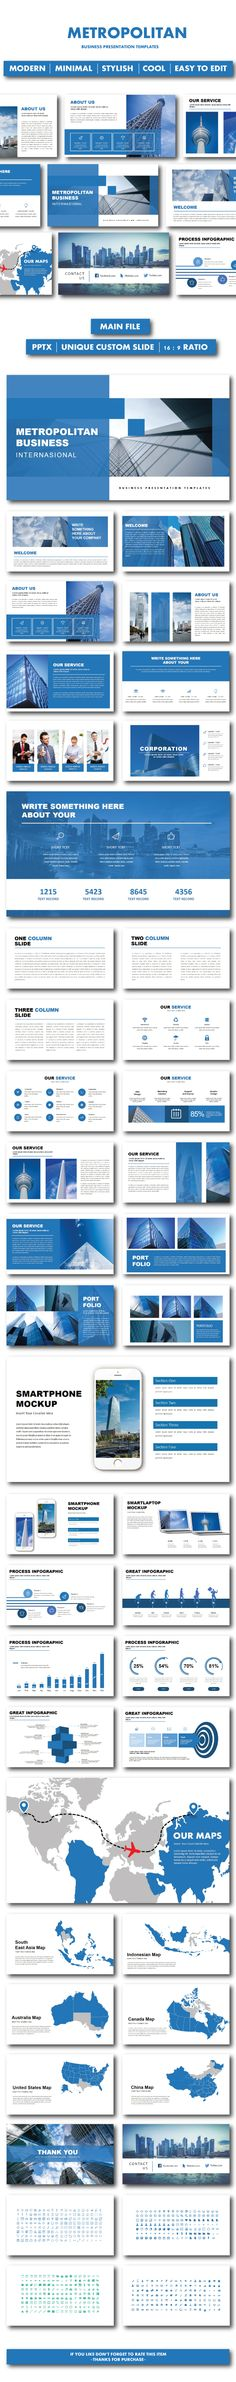 Metropolitan Business PowerPoint Templates